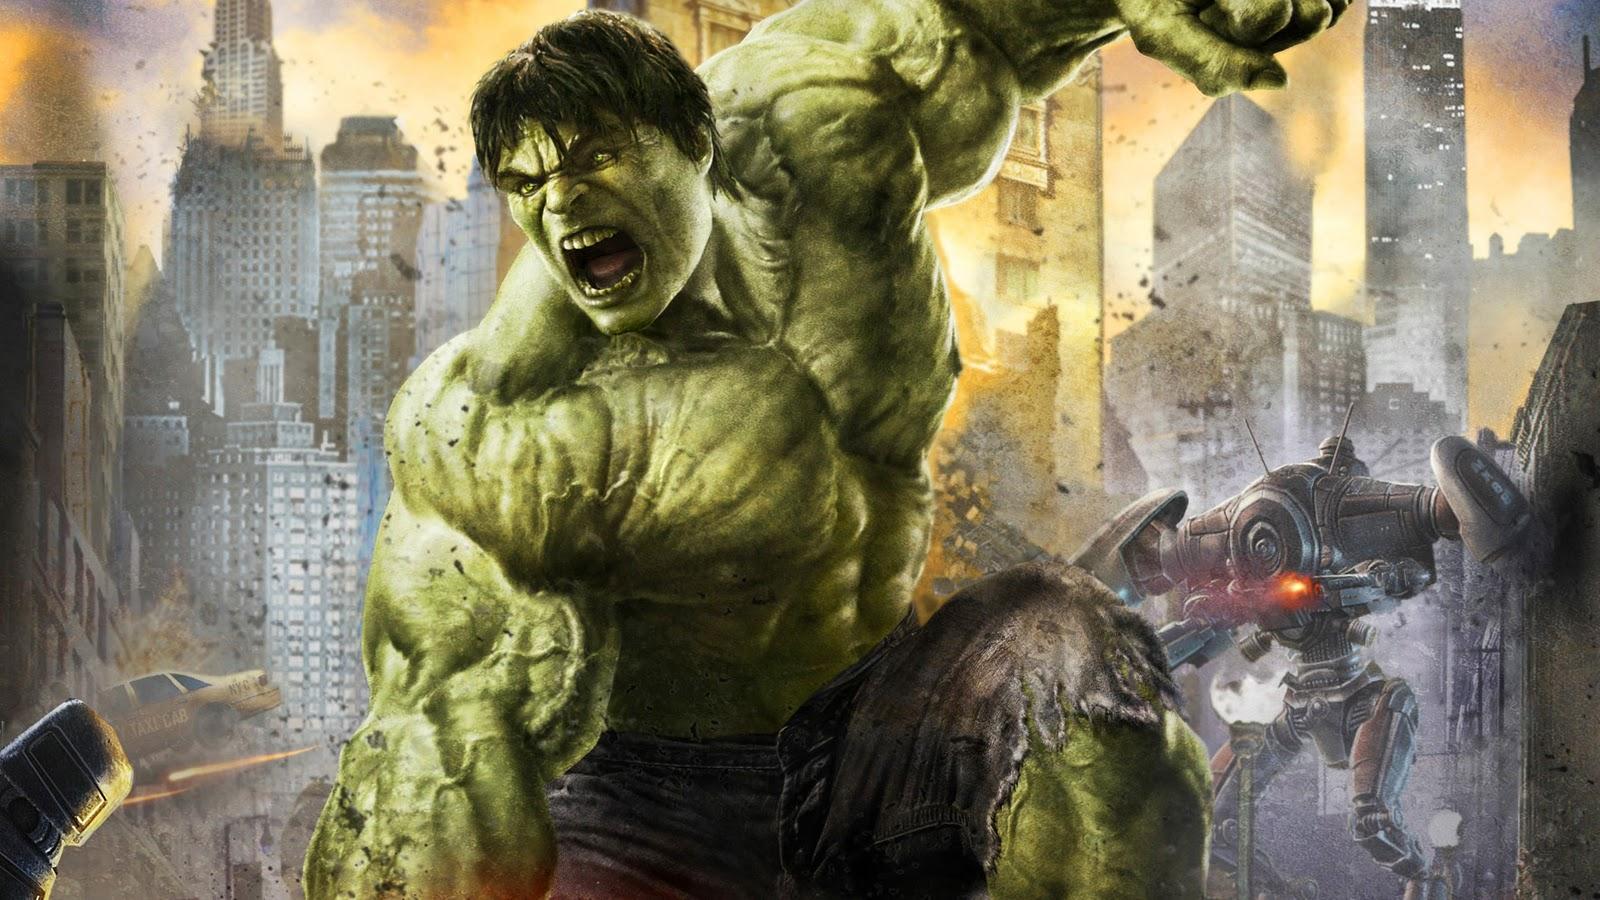 hulk bureaublad achtergrond grote boze hulk wallpaper in hd hulk in 1600x900